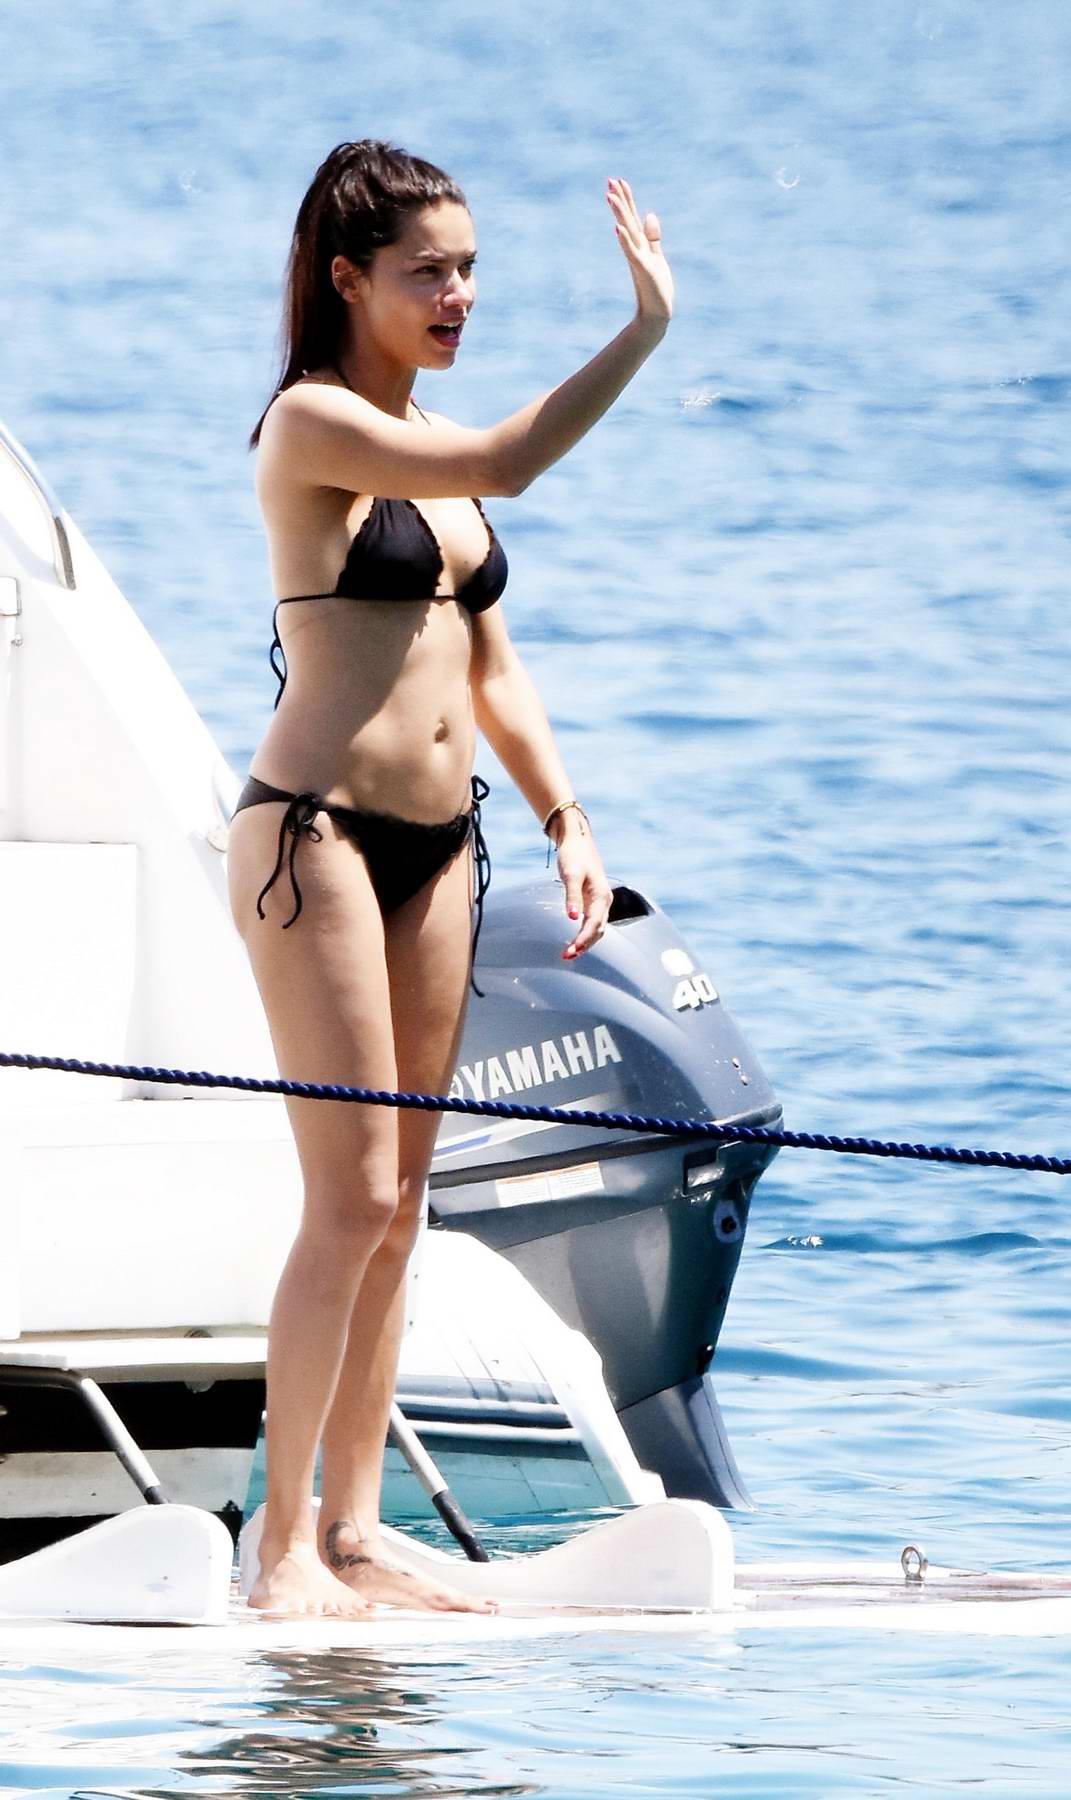 Adriana Lima in a Black Bikini on a Yacht in Bodrum, Turkey